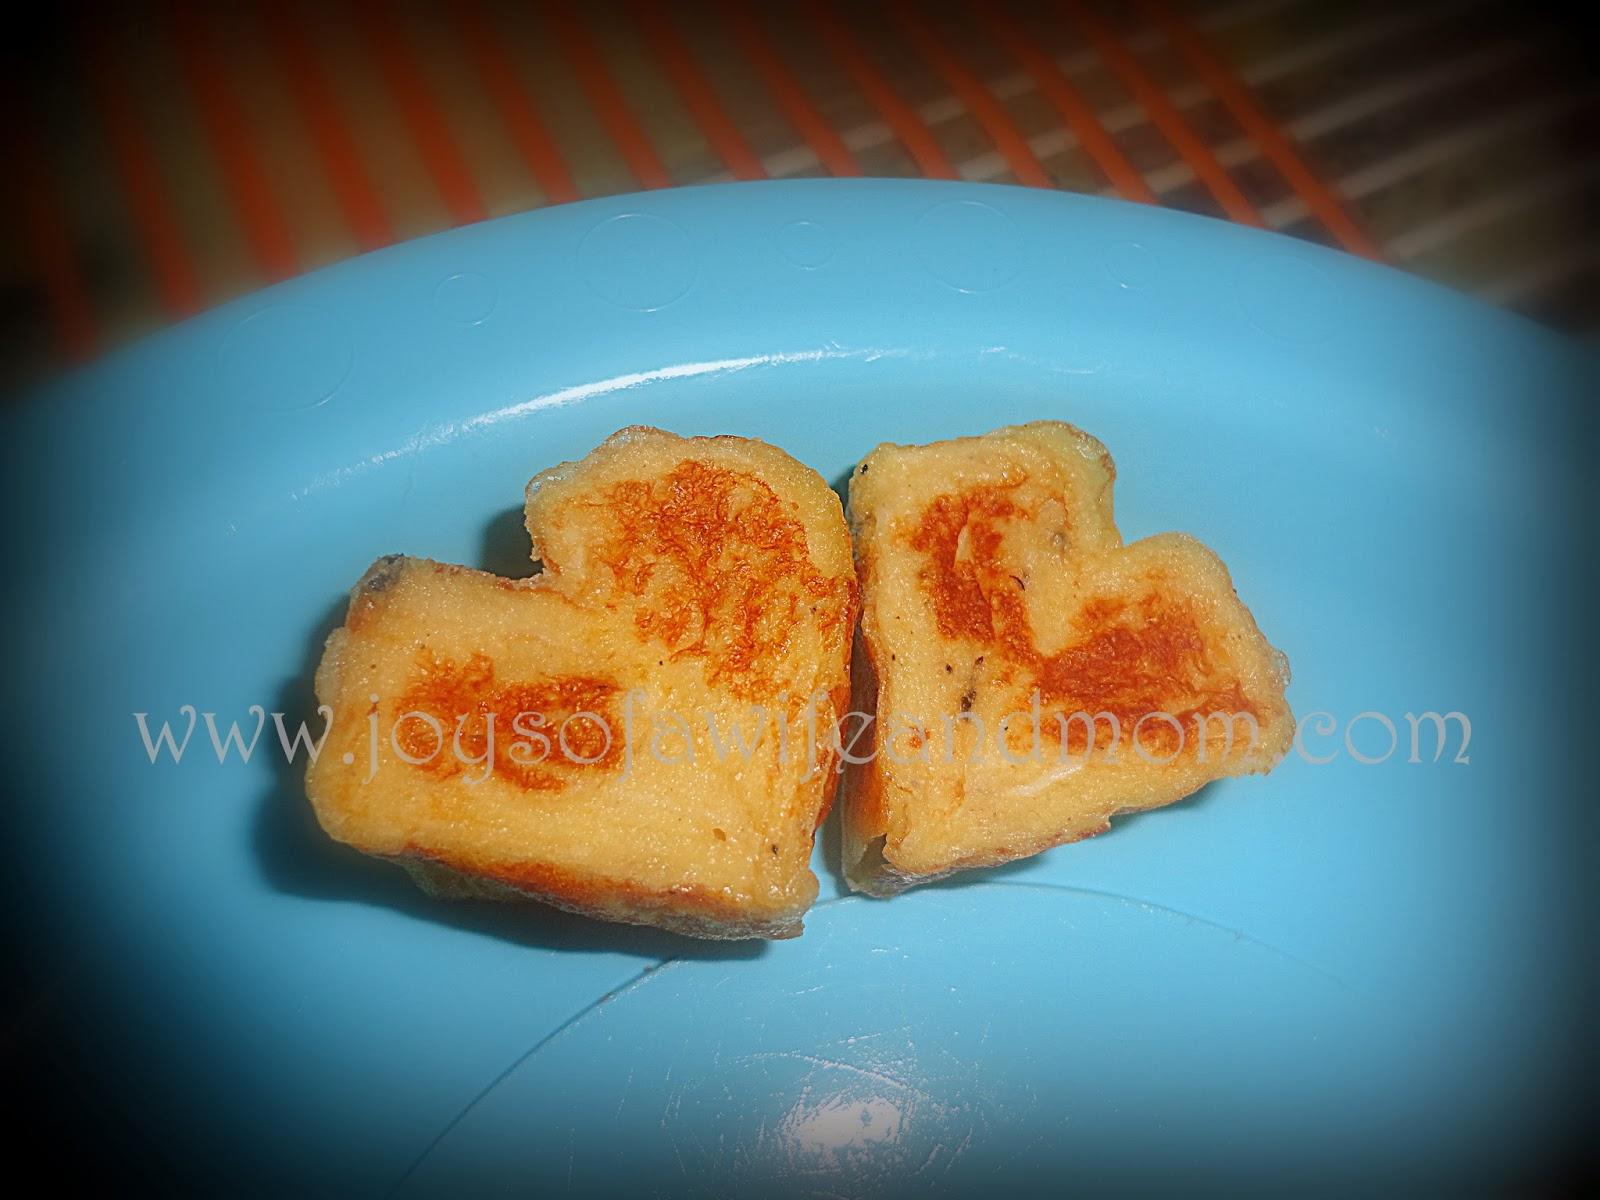 how to make tamagoyaki at home